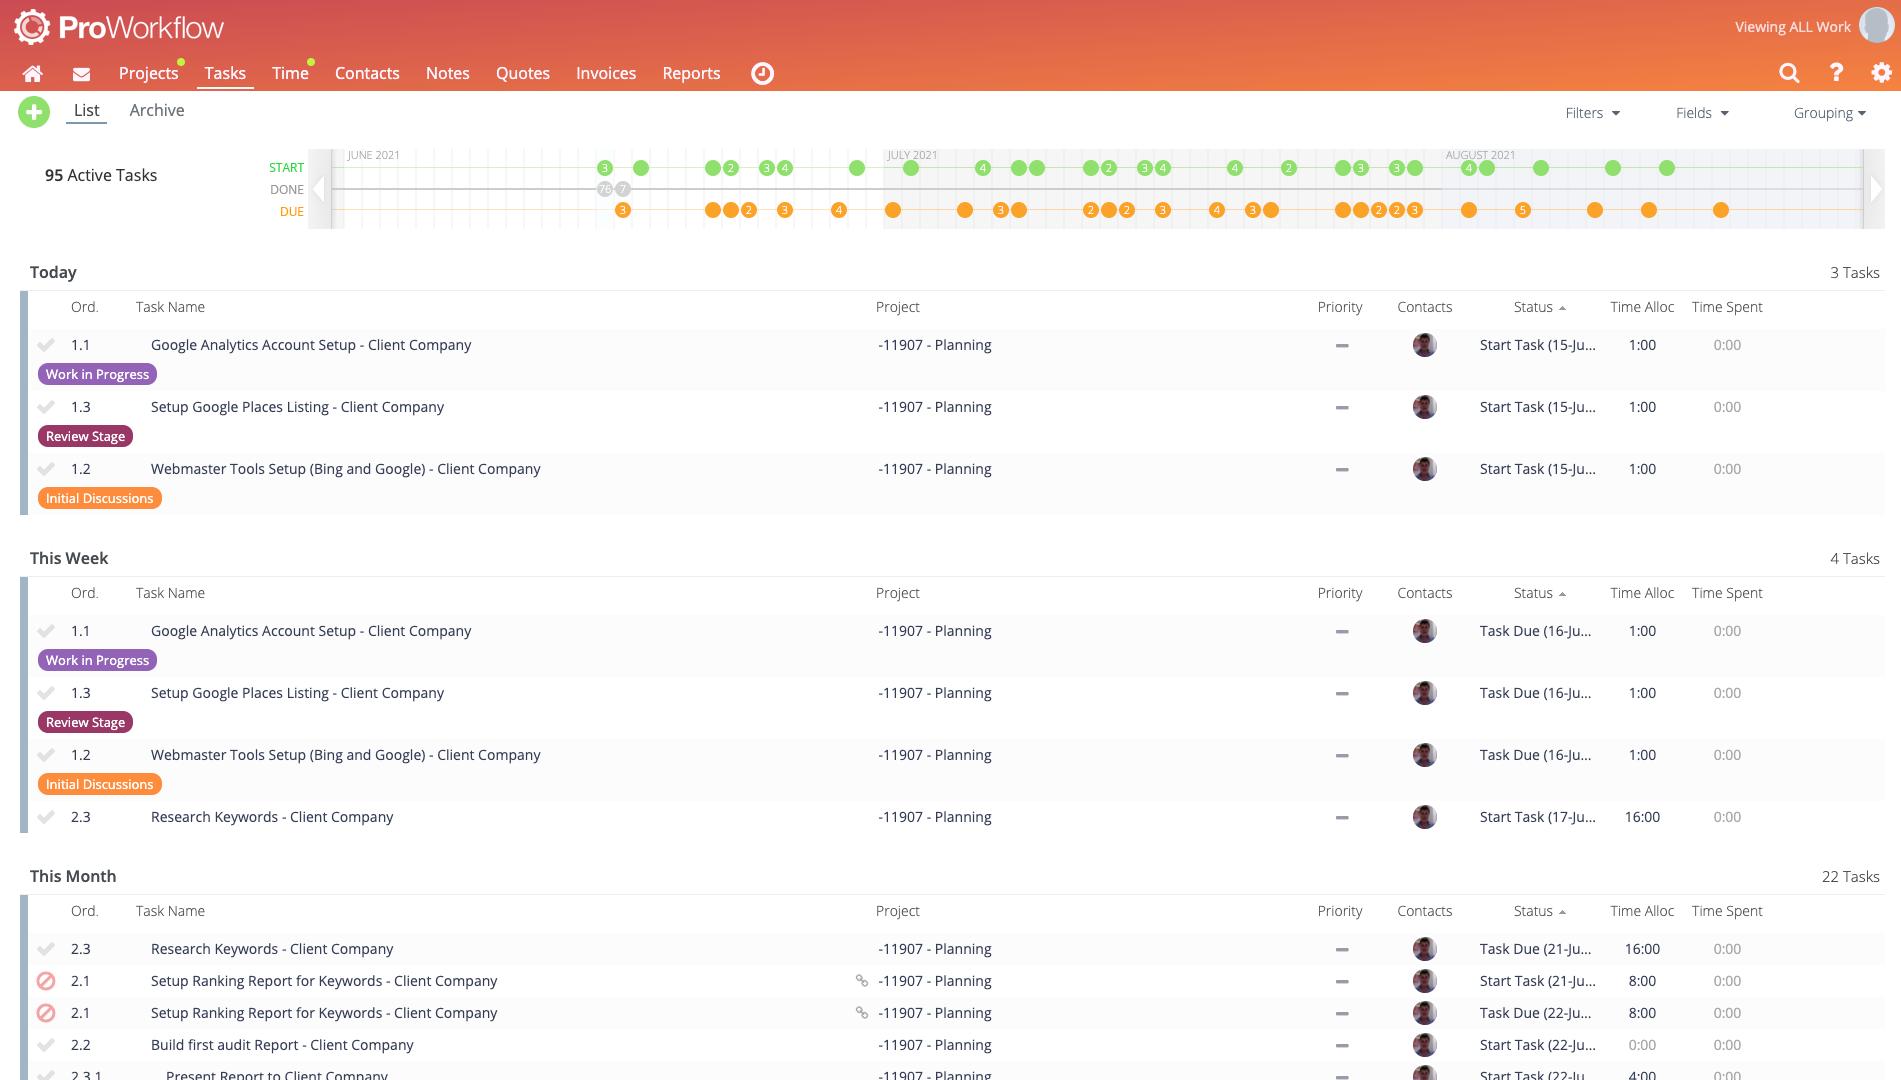 ProWorkflow Software - Upcoming Tasks